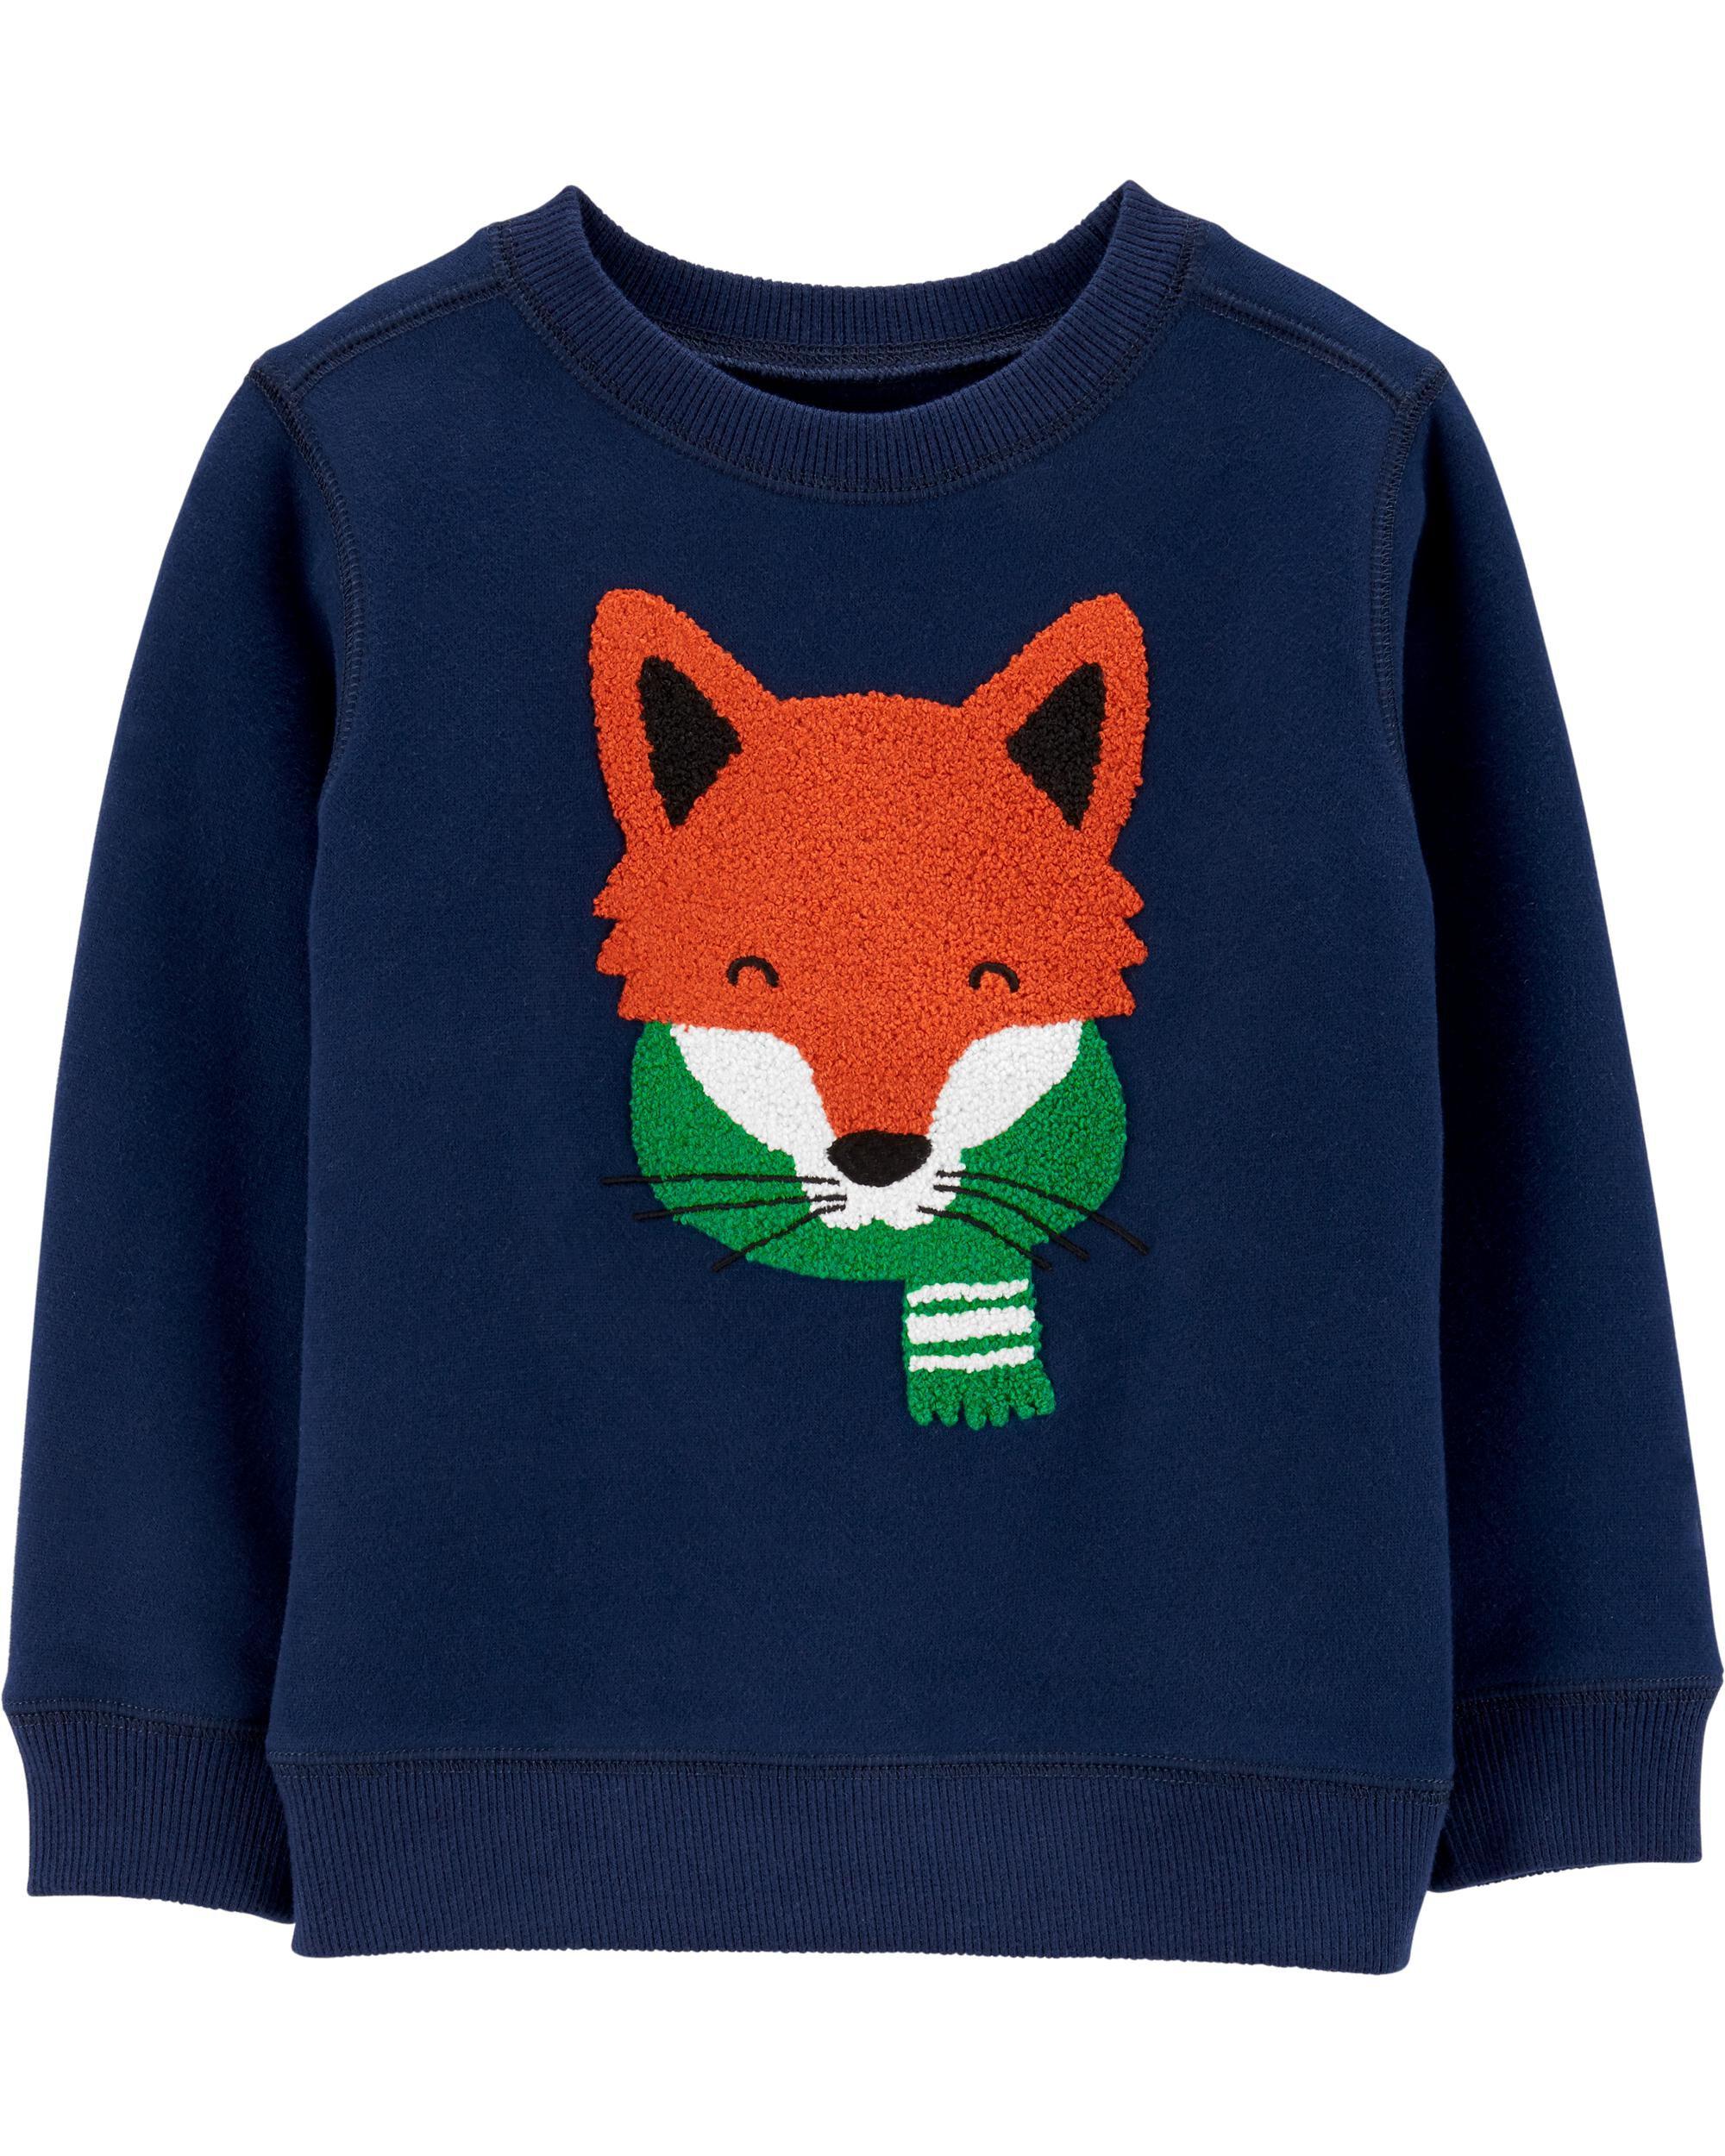 Fox Fleece Sweatshirt